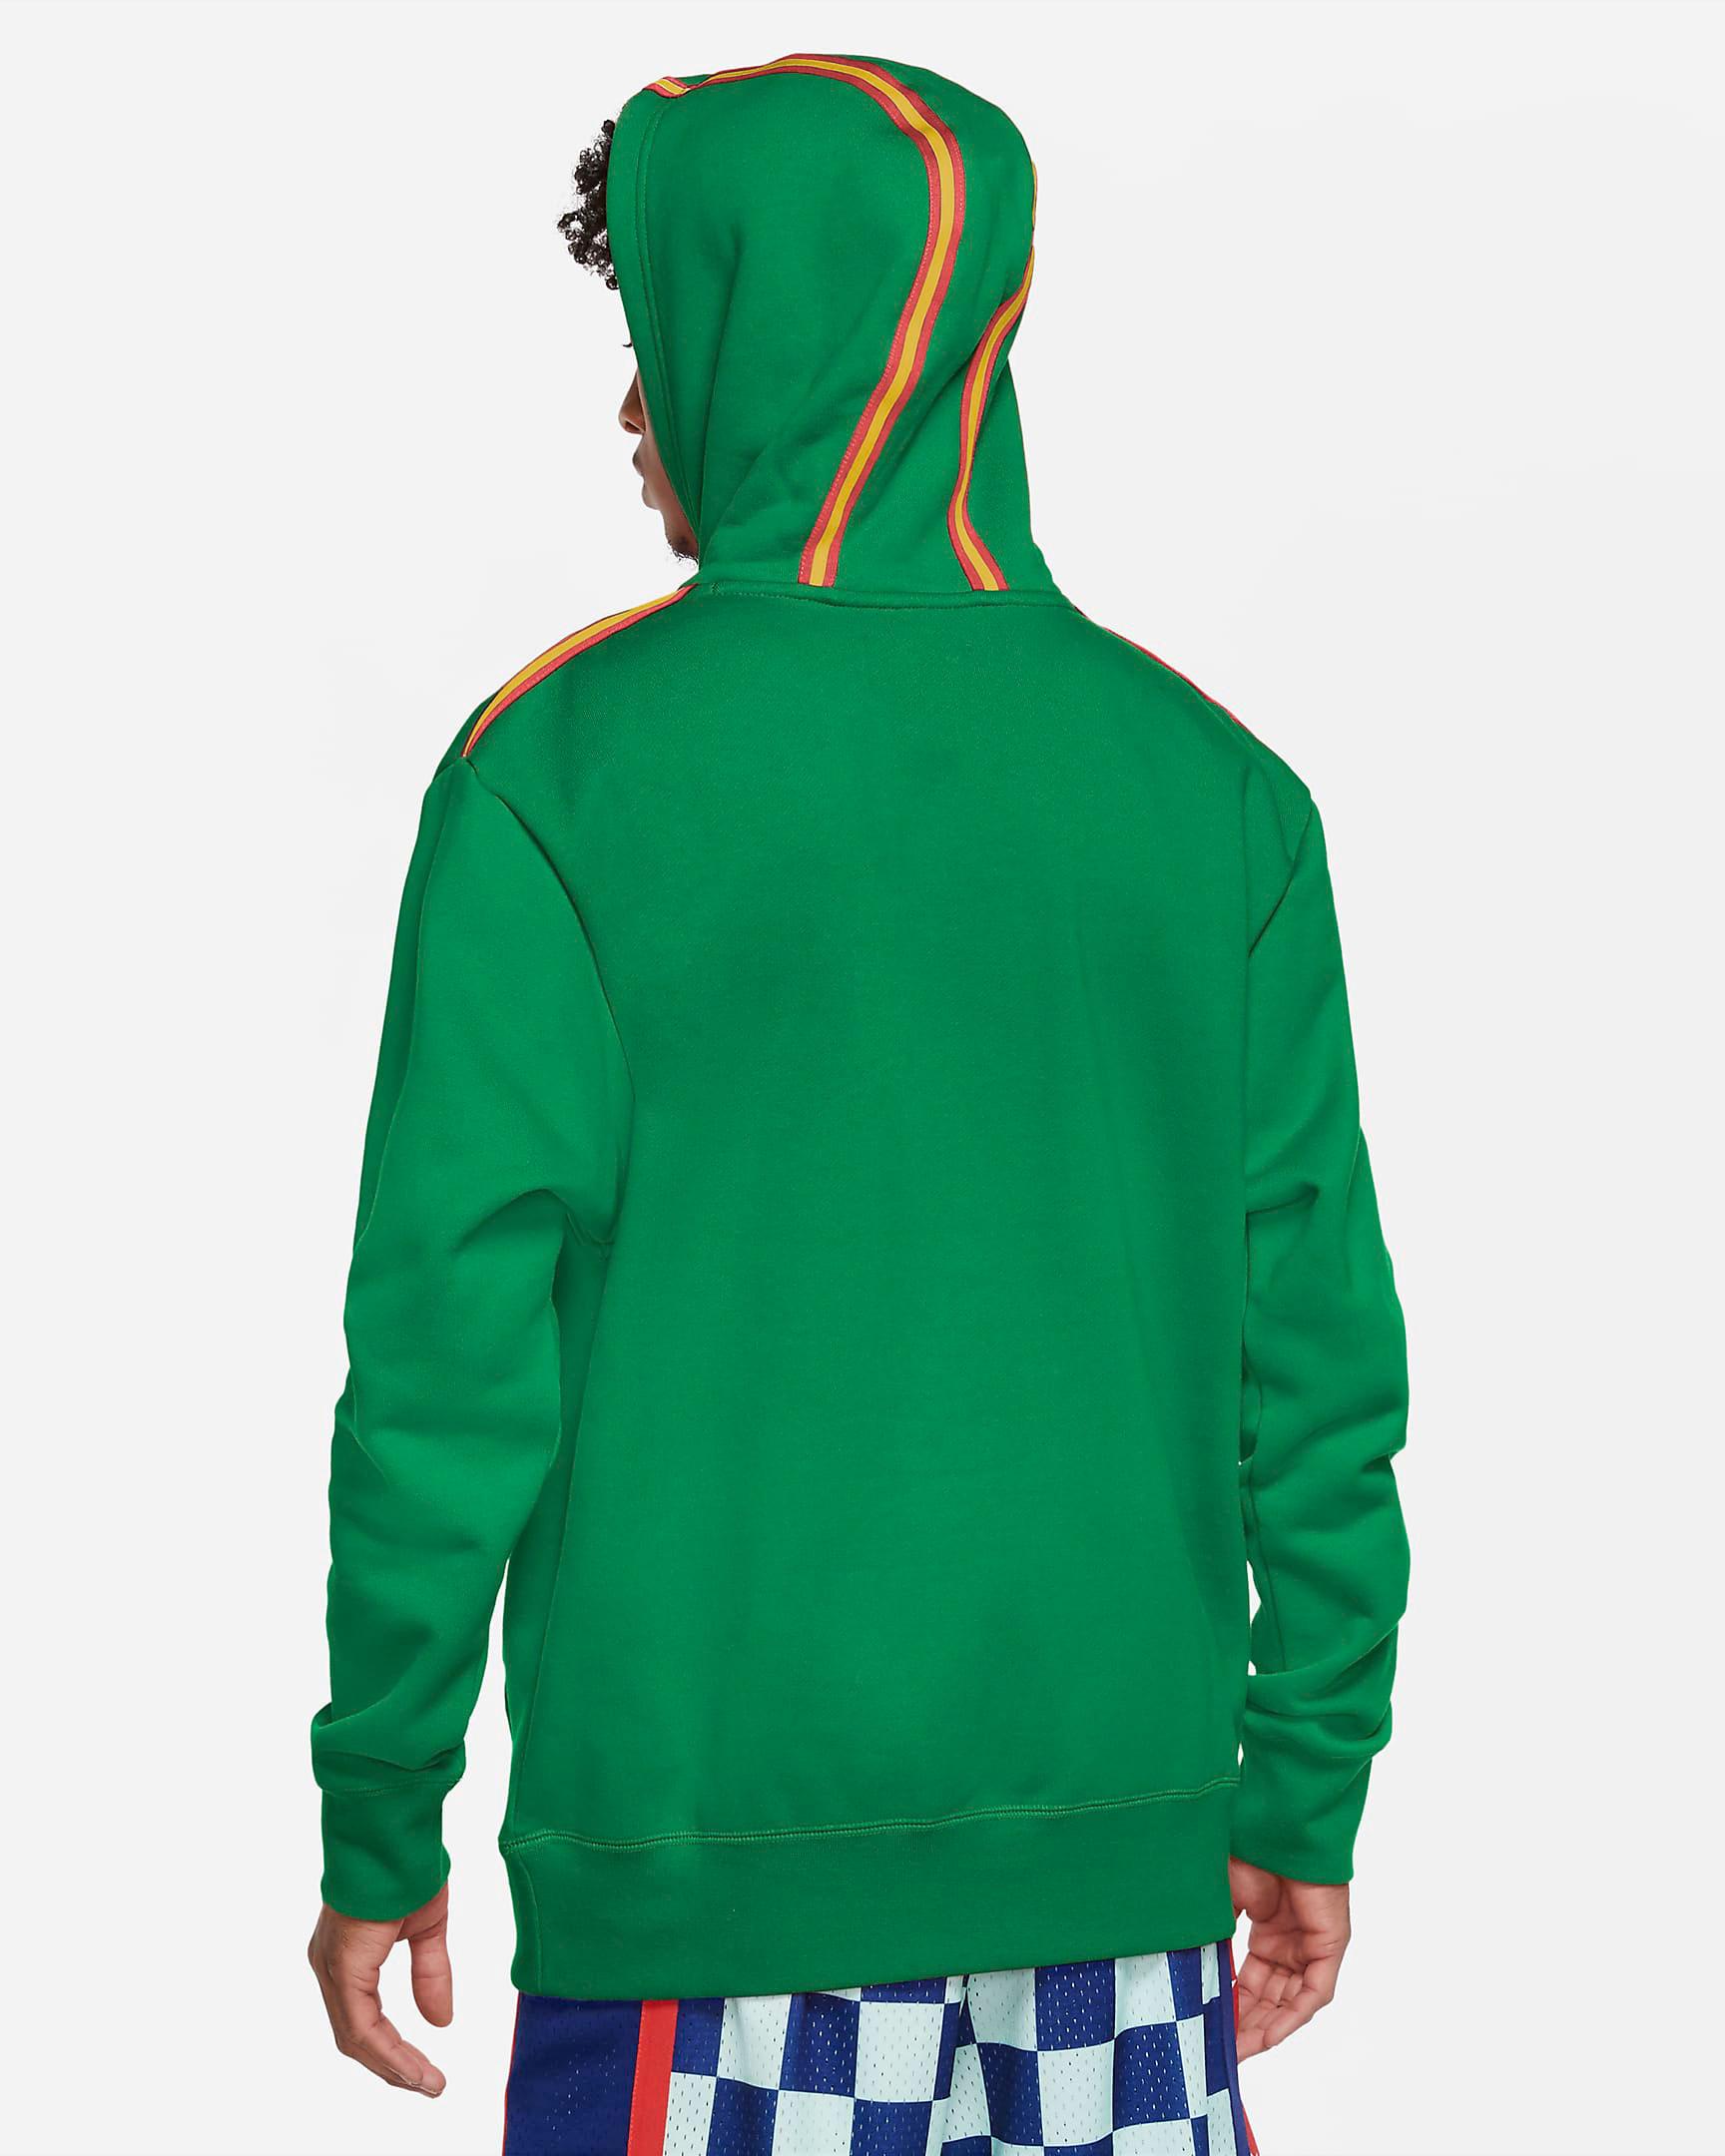 jordan-sport-dna-hoodie-green-gold-red-2